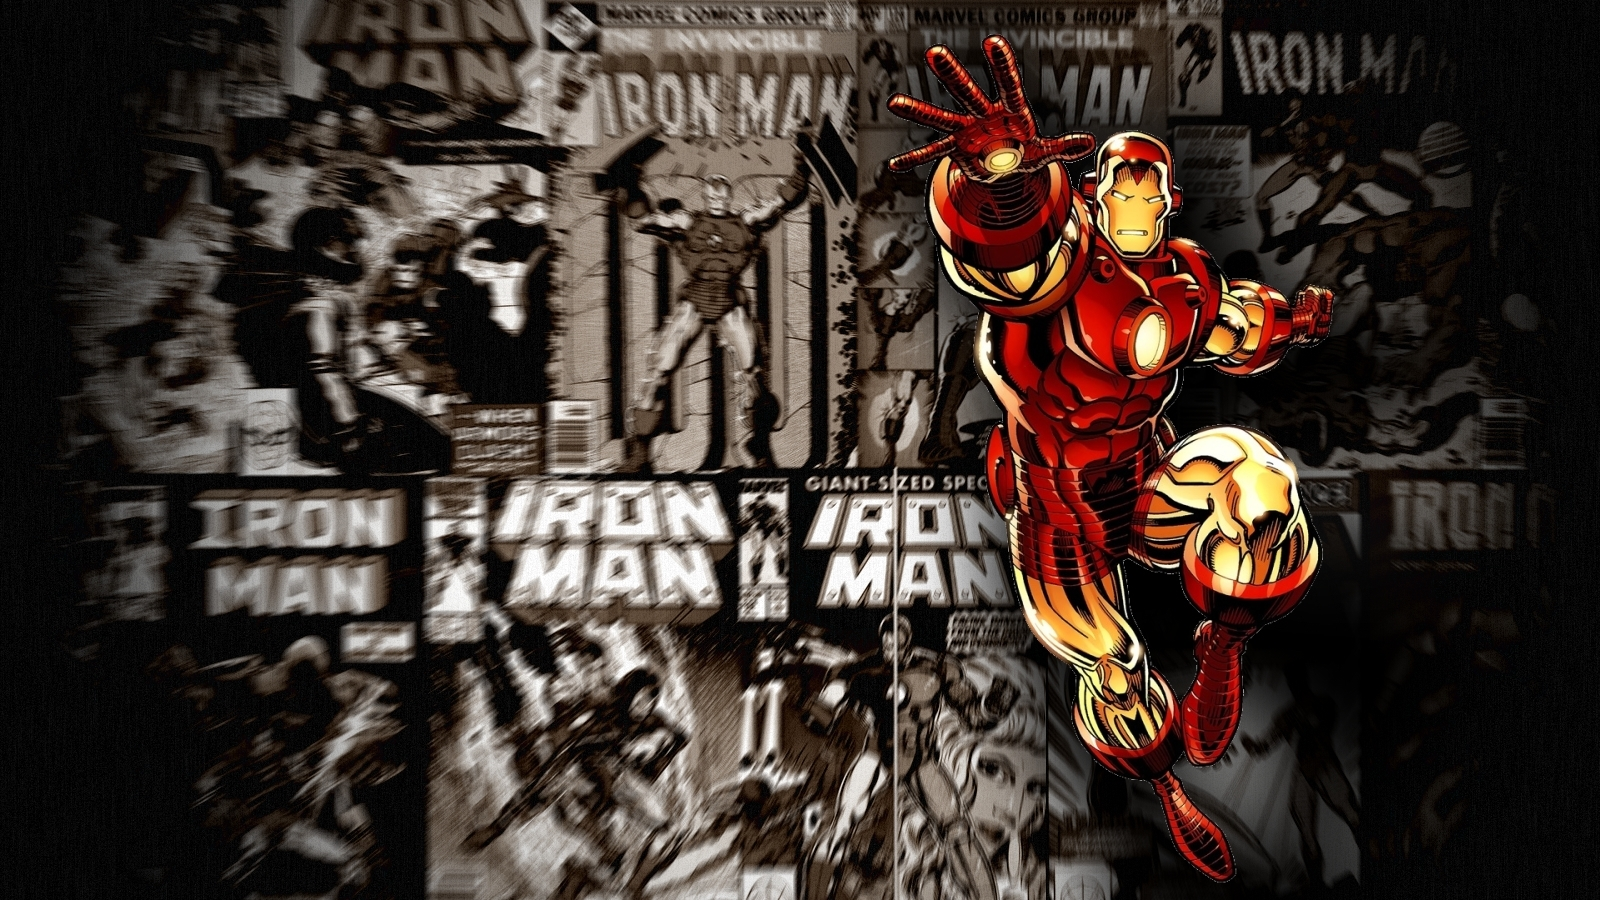 http://2.bp.blogspot.com/-tGW25bgIYvE/UNx0qSwZunI/AAAAAAAAULo/s-ukRl7OeZM/s1600/Iron_Man_Comic_Wallpaper.jpg